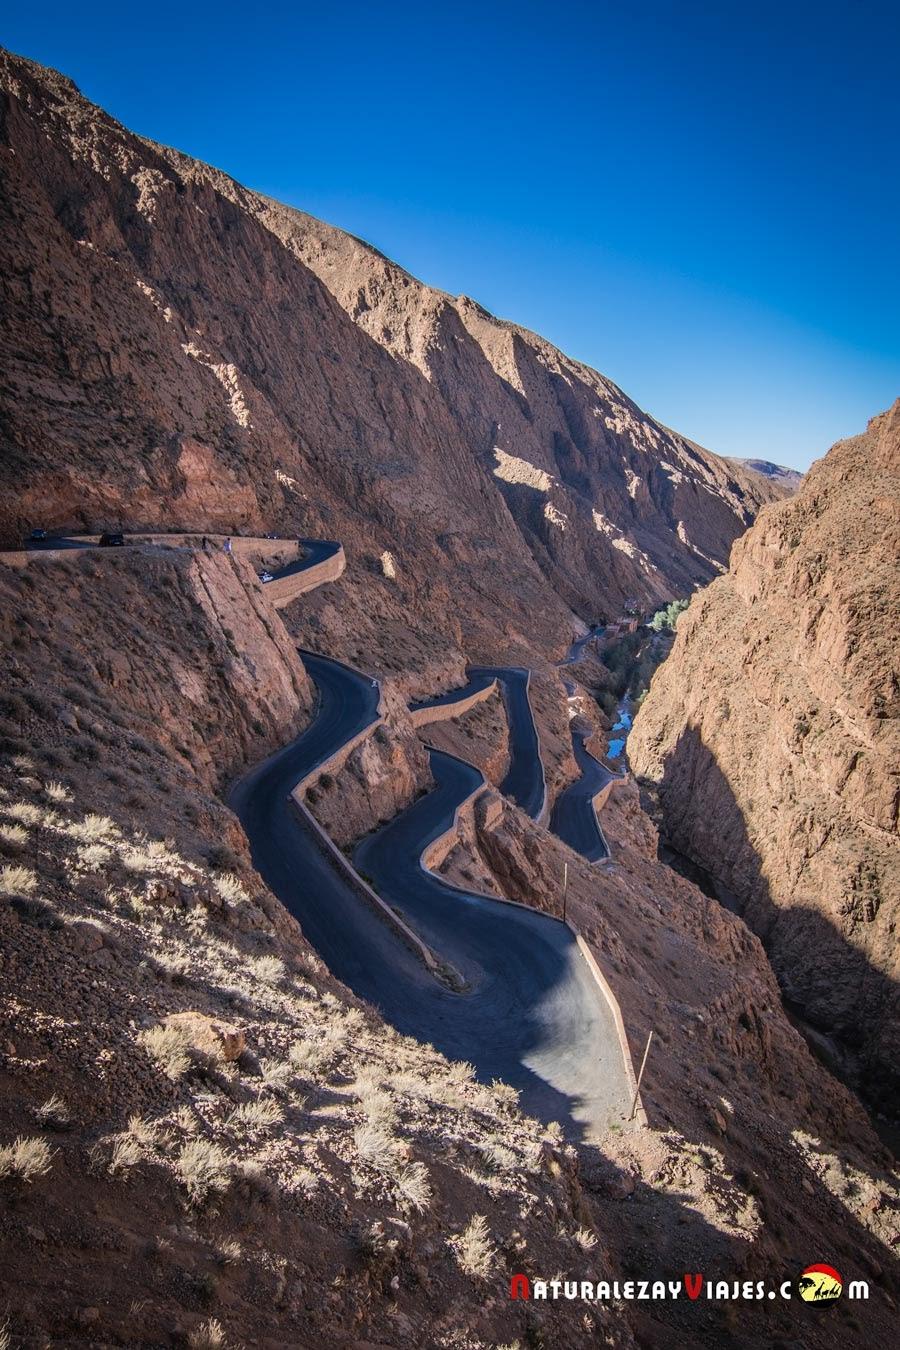 Carretera R704, Atlas, Marruecos